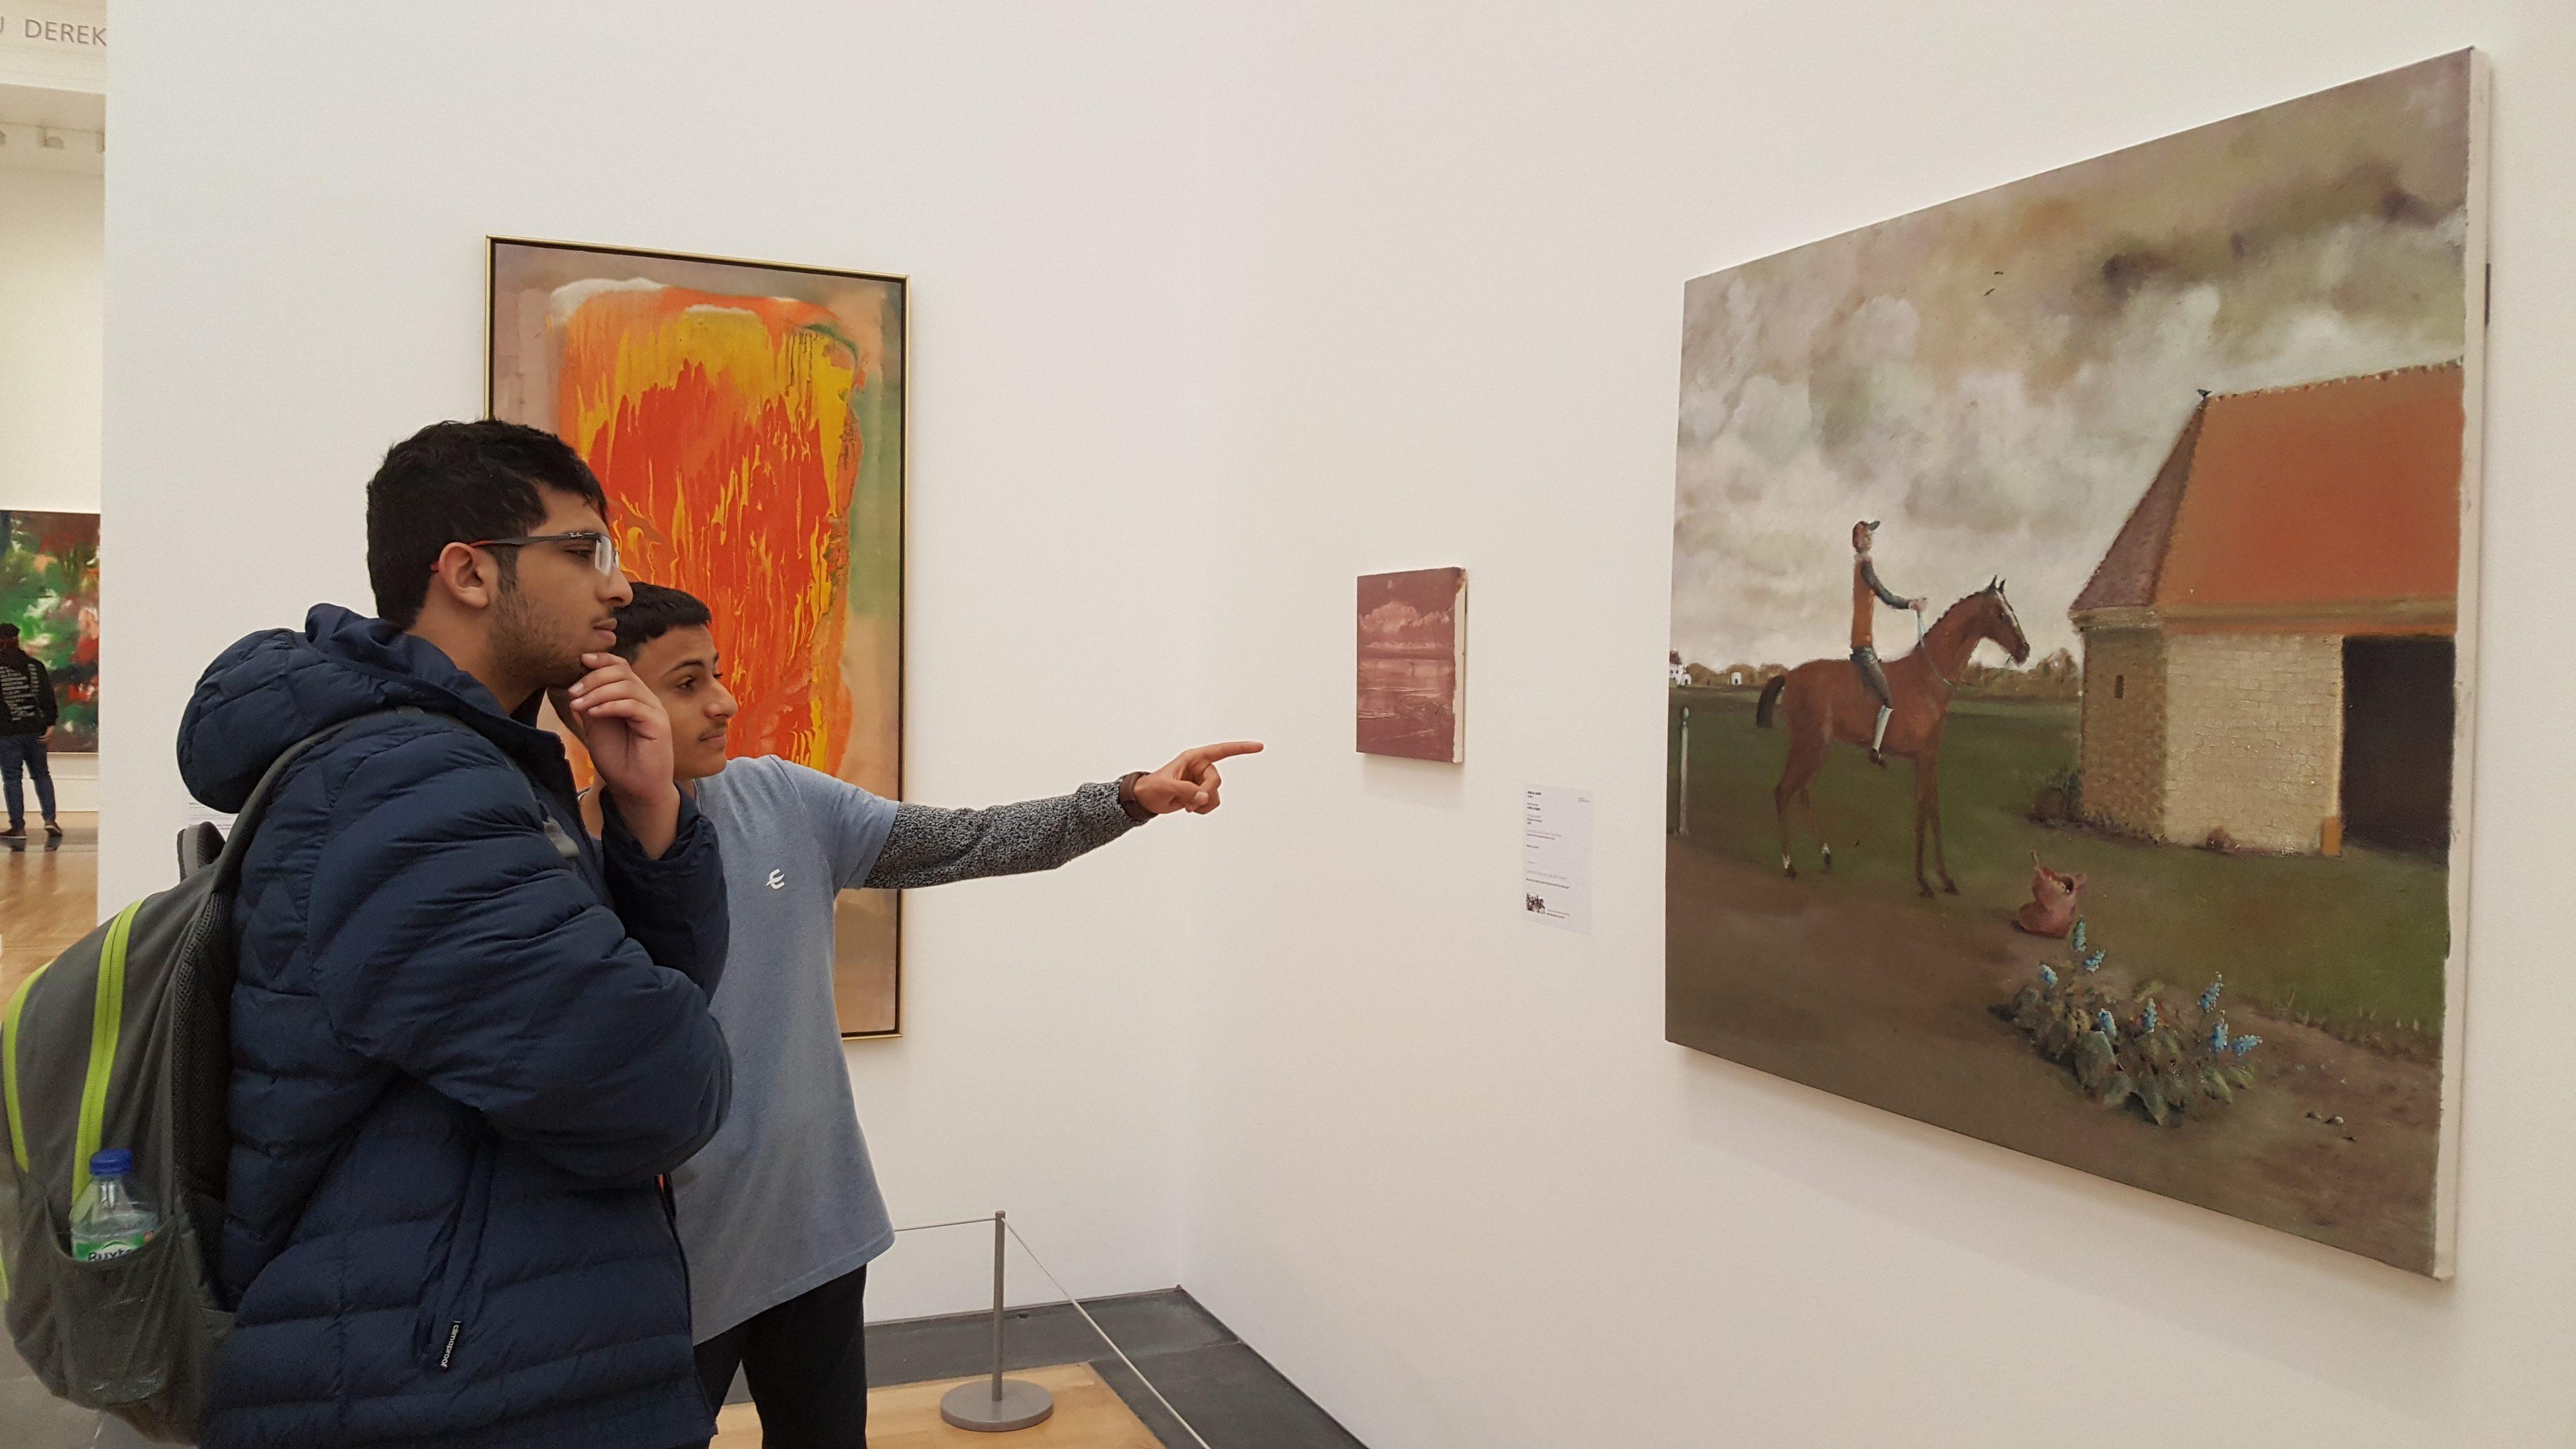 20171207 114621 - Gallery